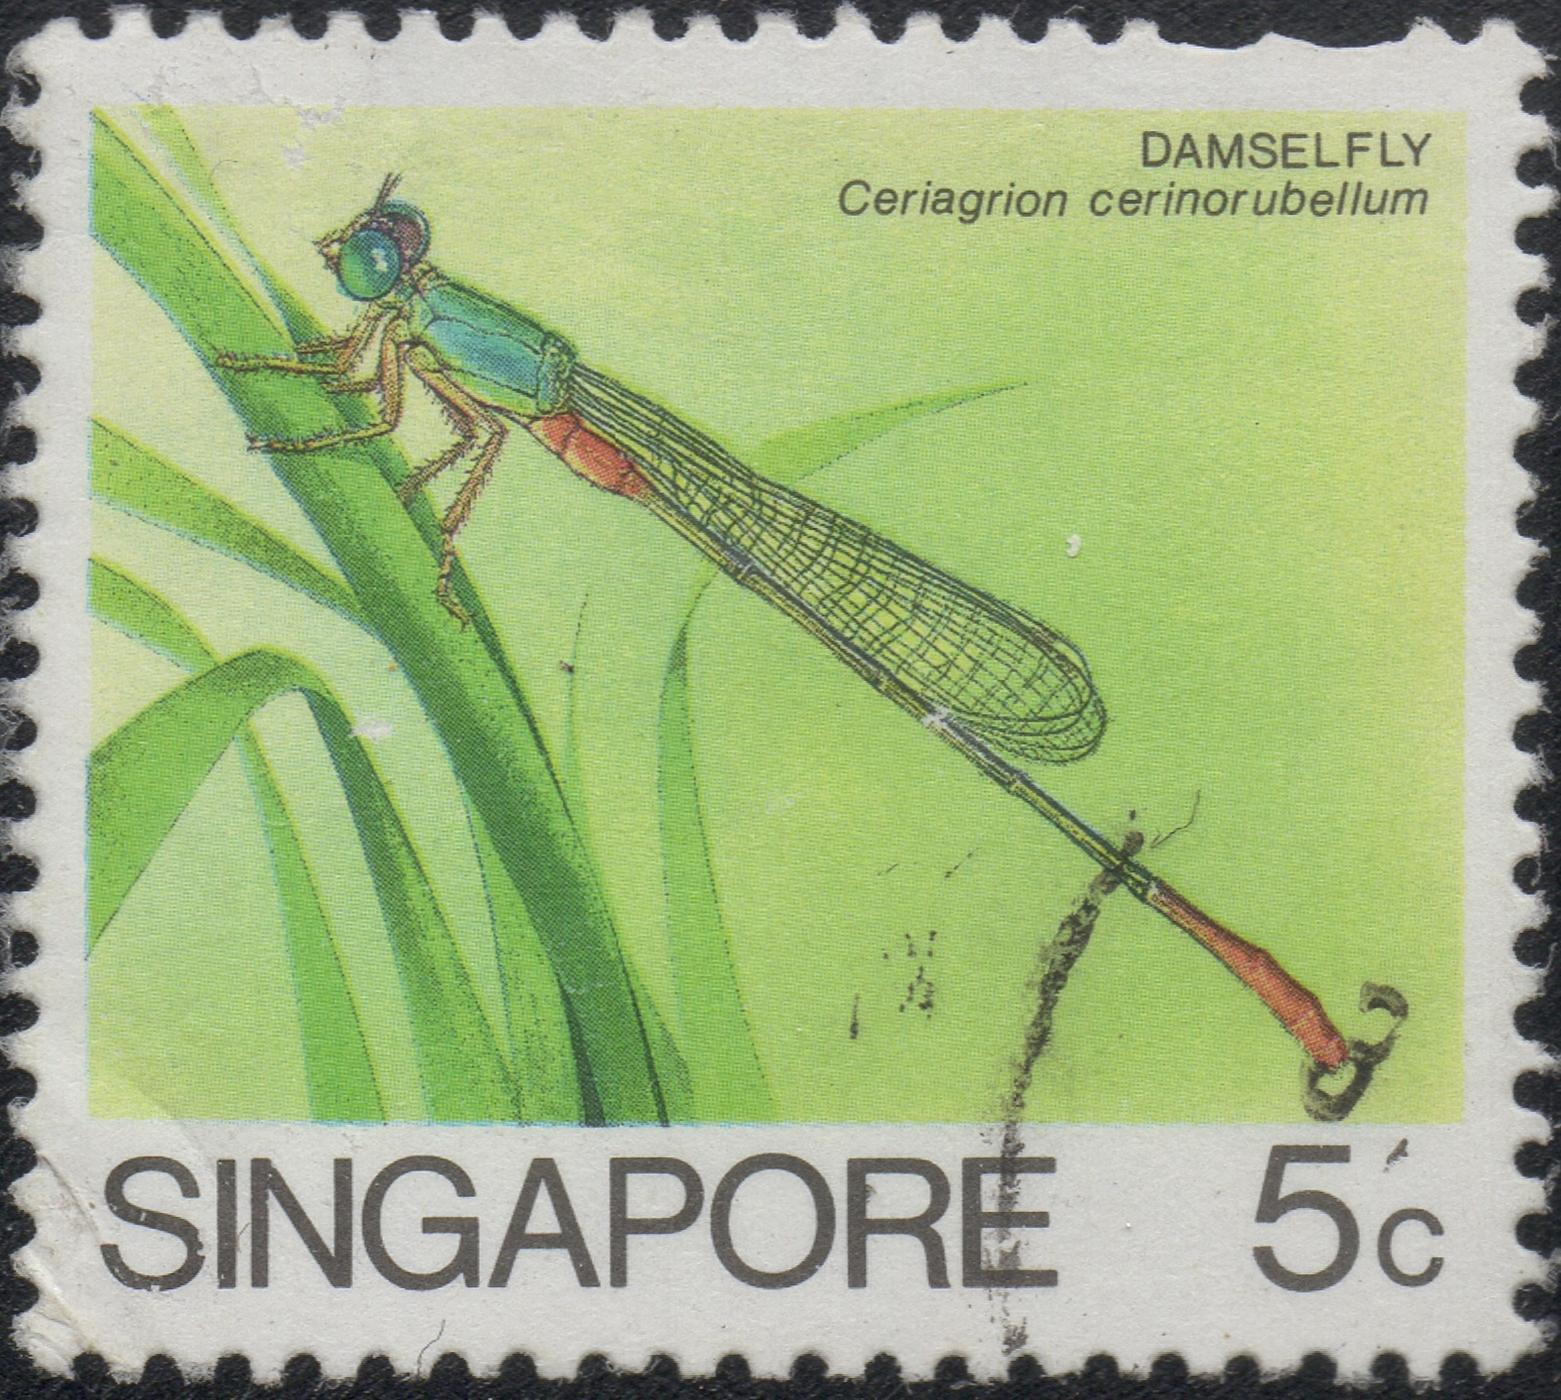 Singapore - Scott #453 (1985)